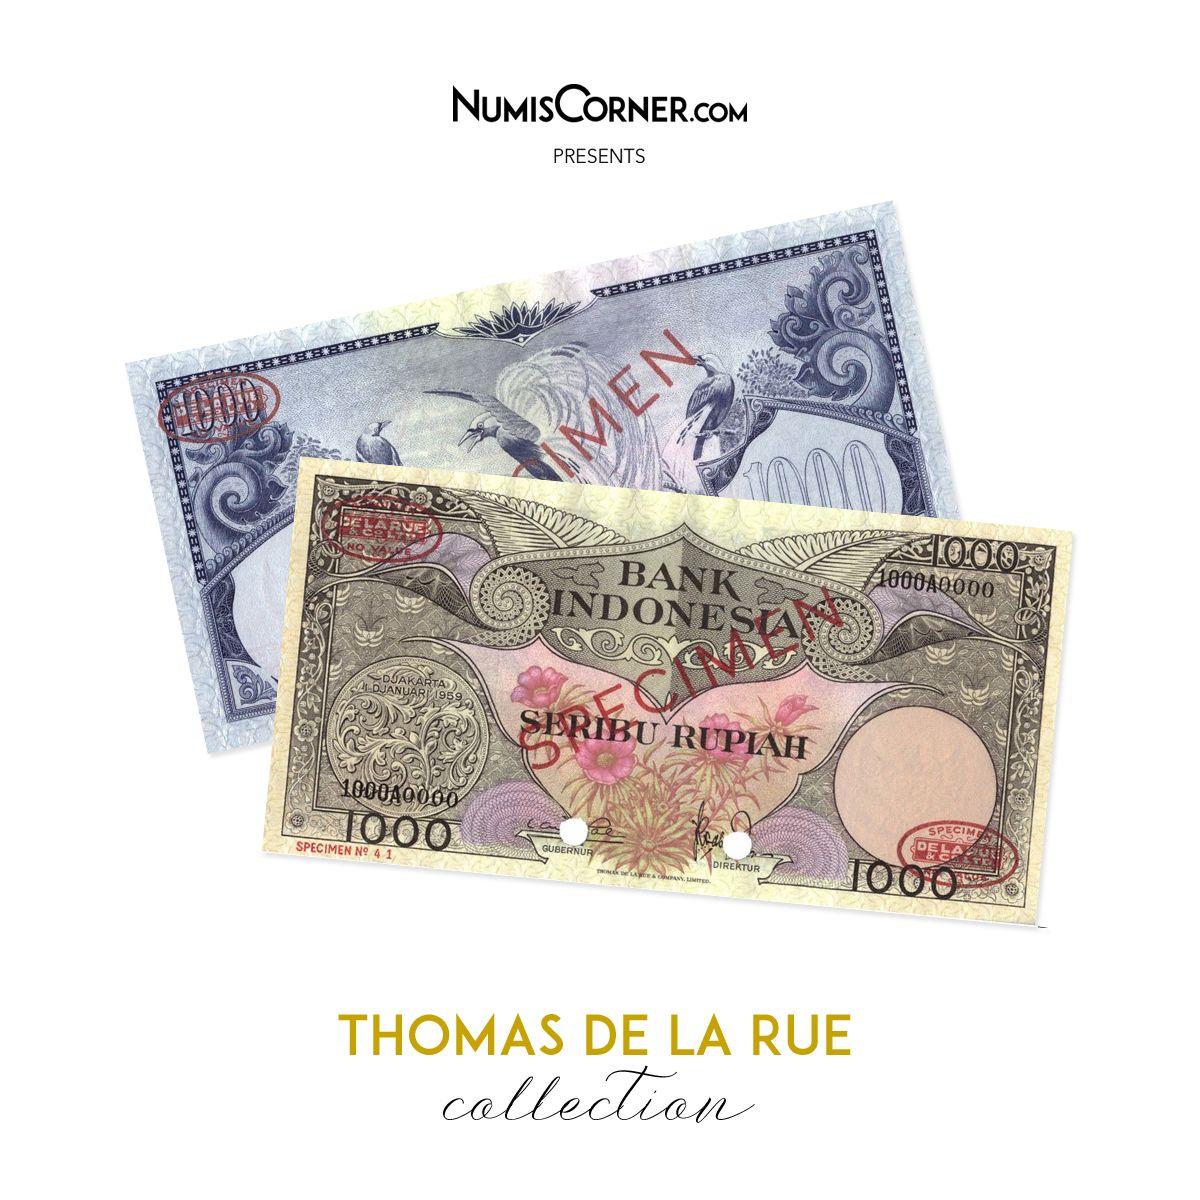 Banknote Indonesia 1000 Rupiah 1959 Specimen TDLR